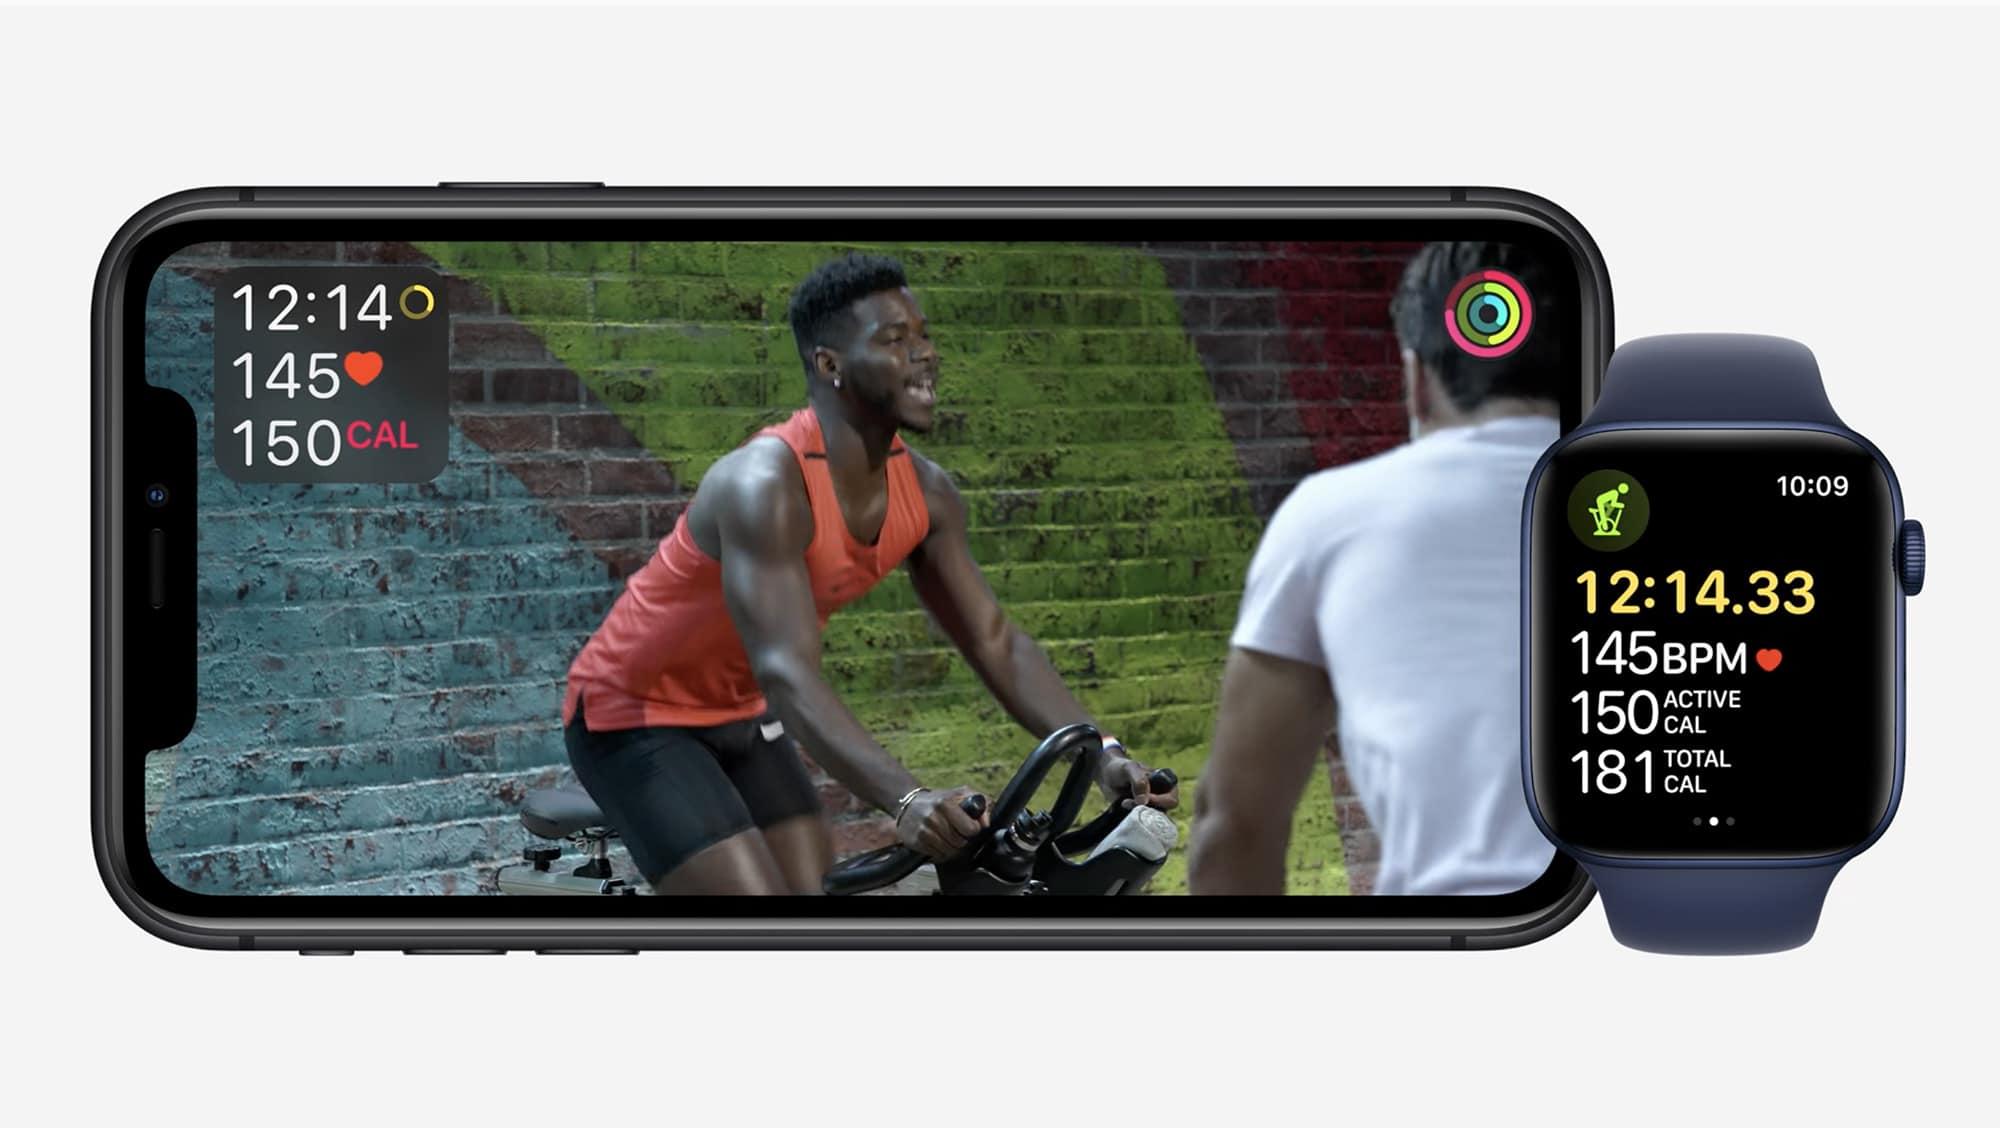 Apple Fitness+ boasts unbeatable Apple Watch integration